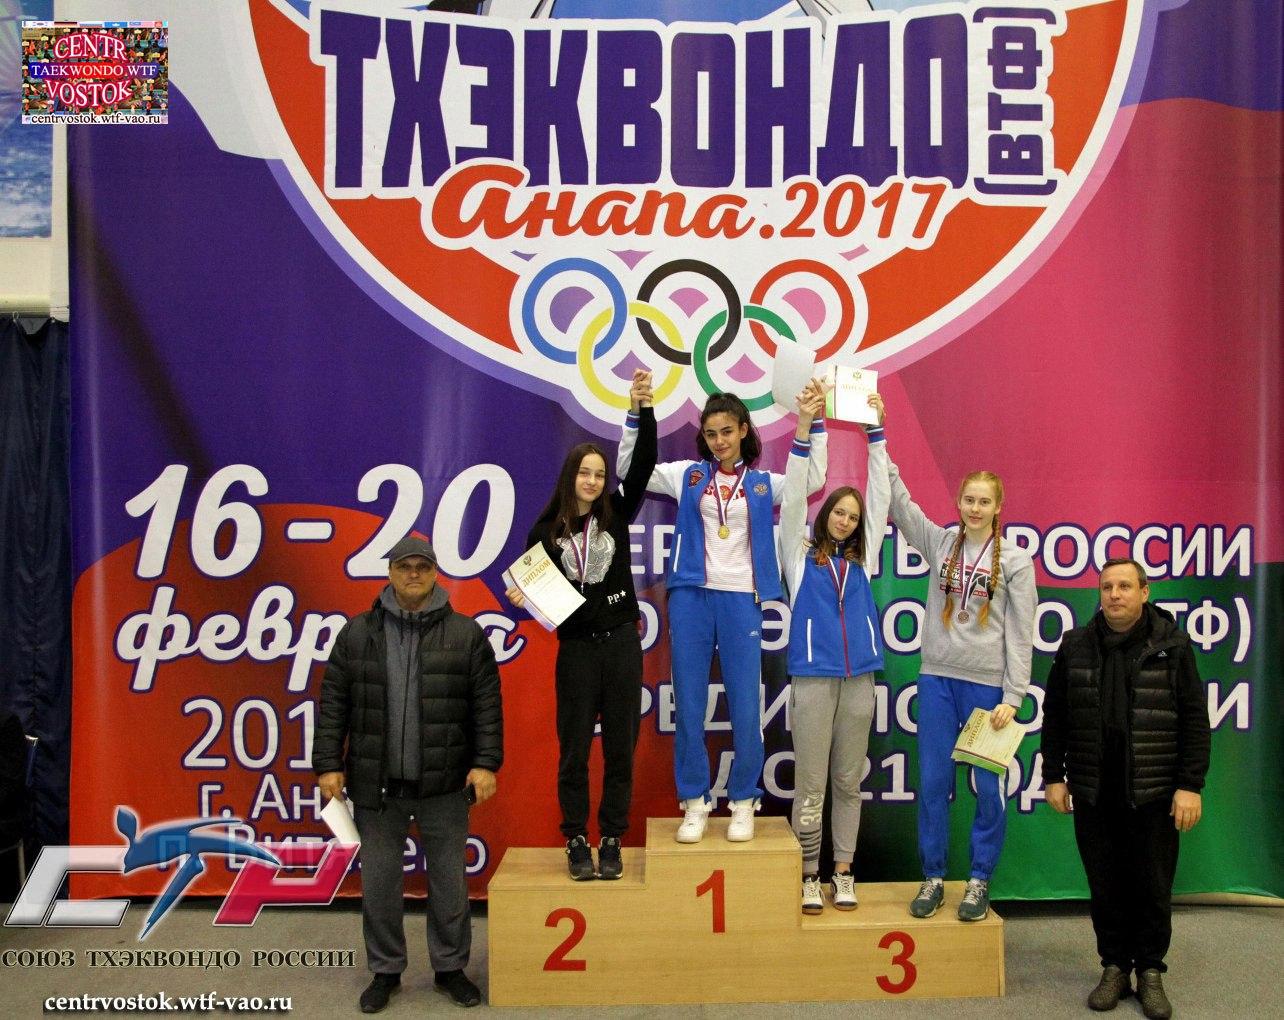 Female_medals_53kg